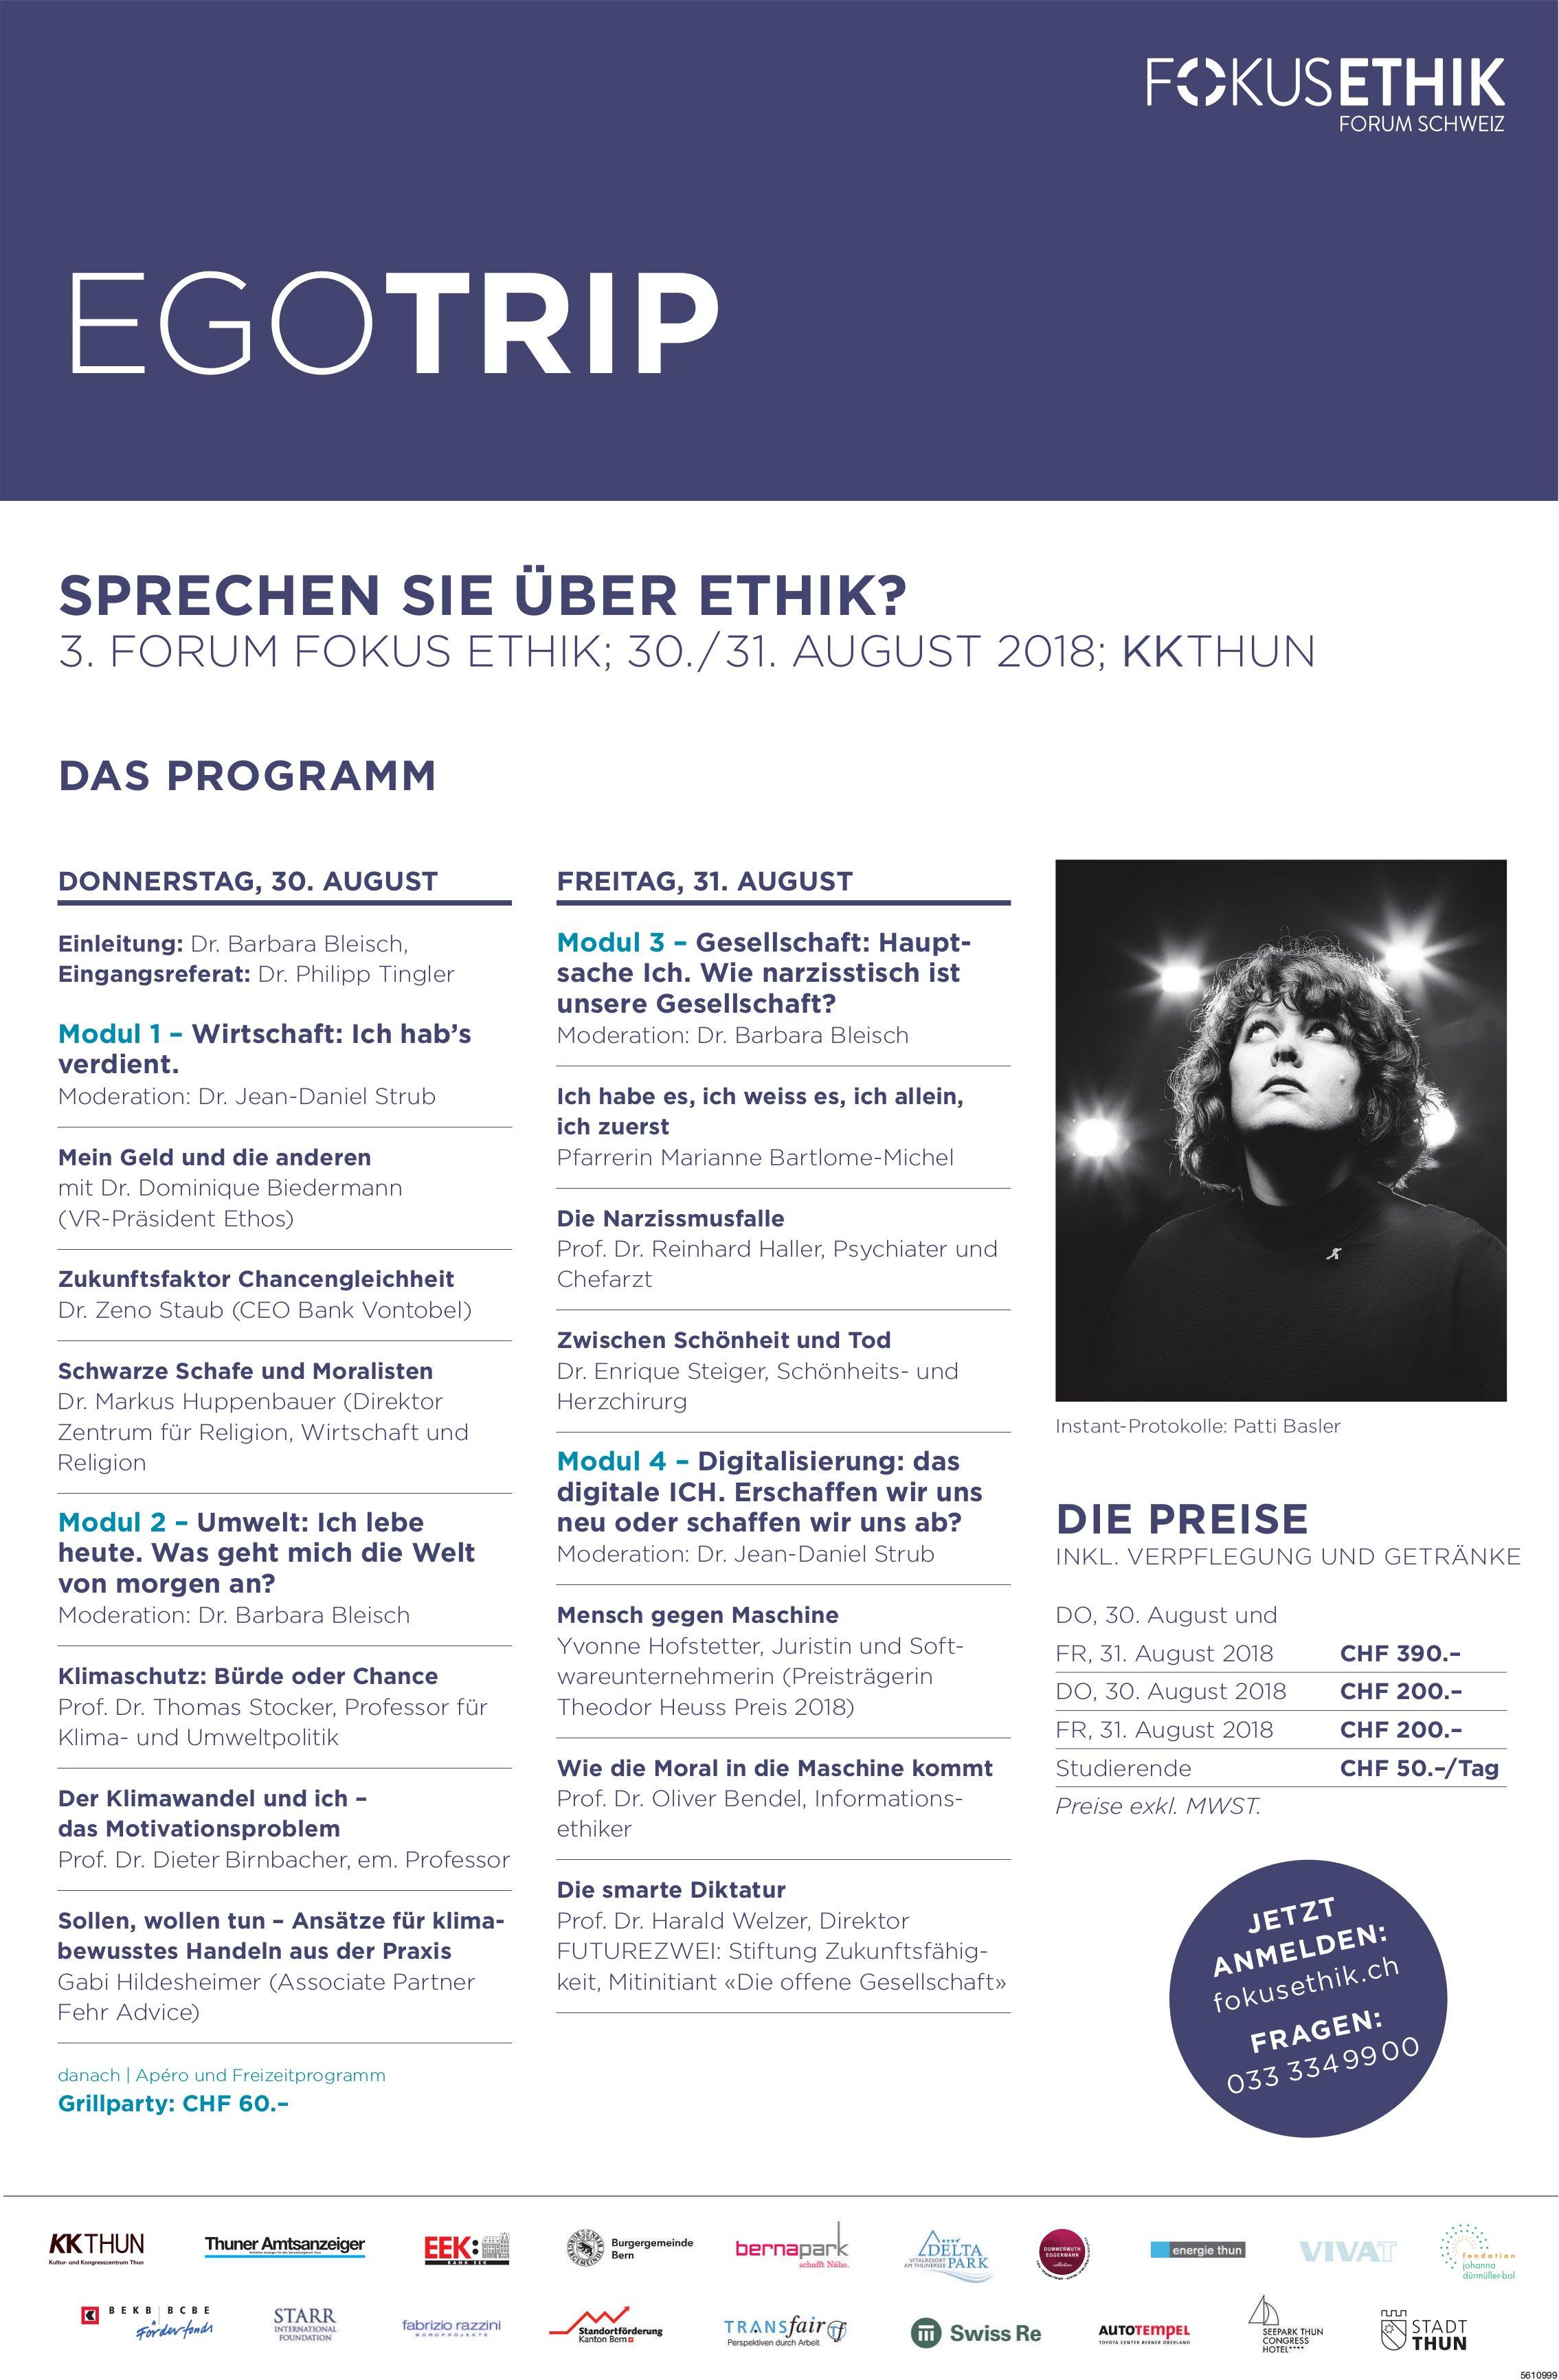 3. Forum Fokus Ethik, 30./31. August, KK Thun